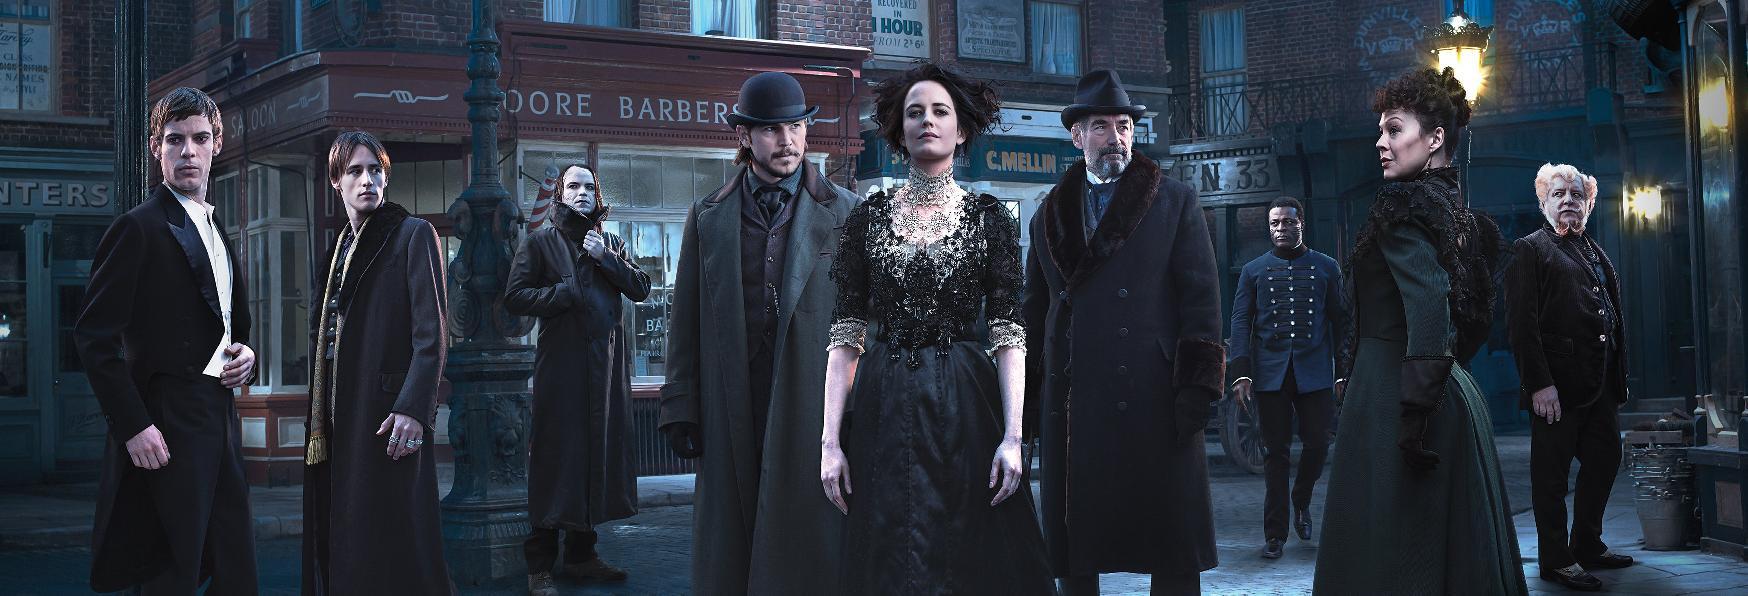 Showtime svilupperà il Sequel di Penny Dreadful: City of Angels